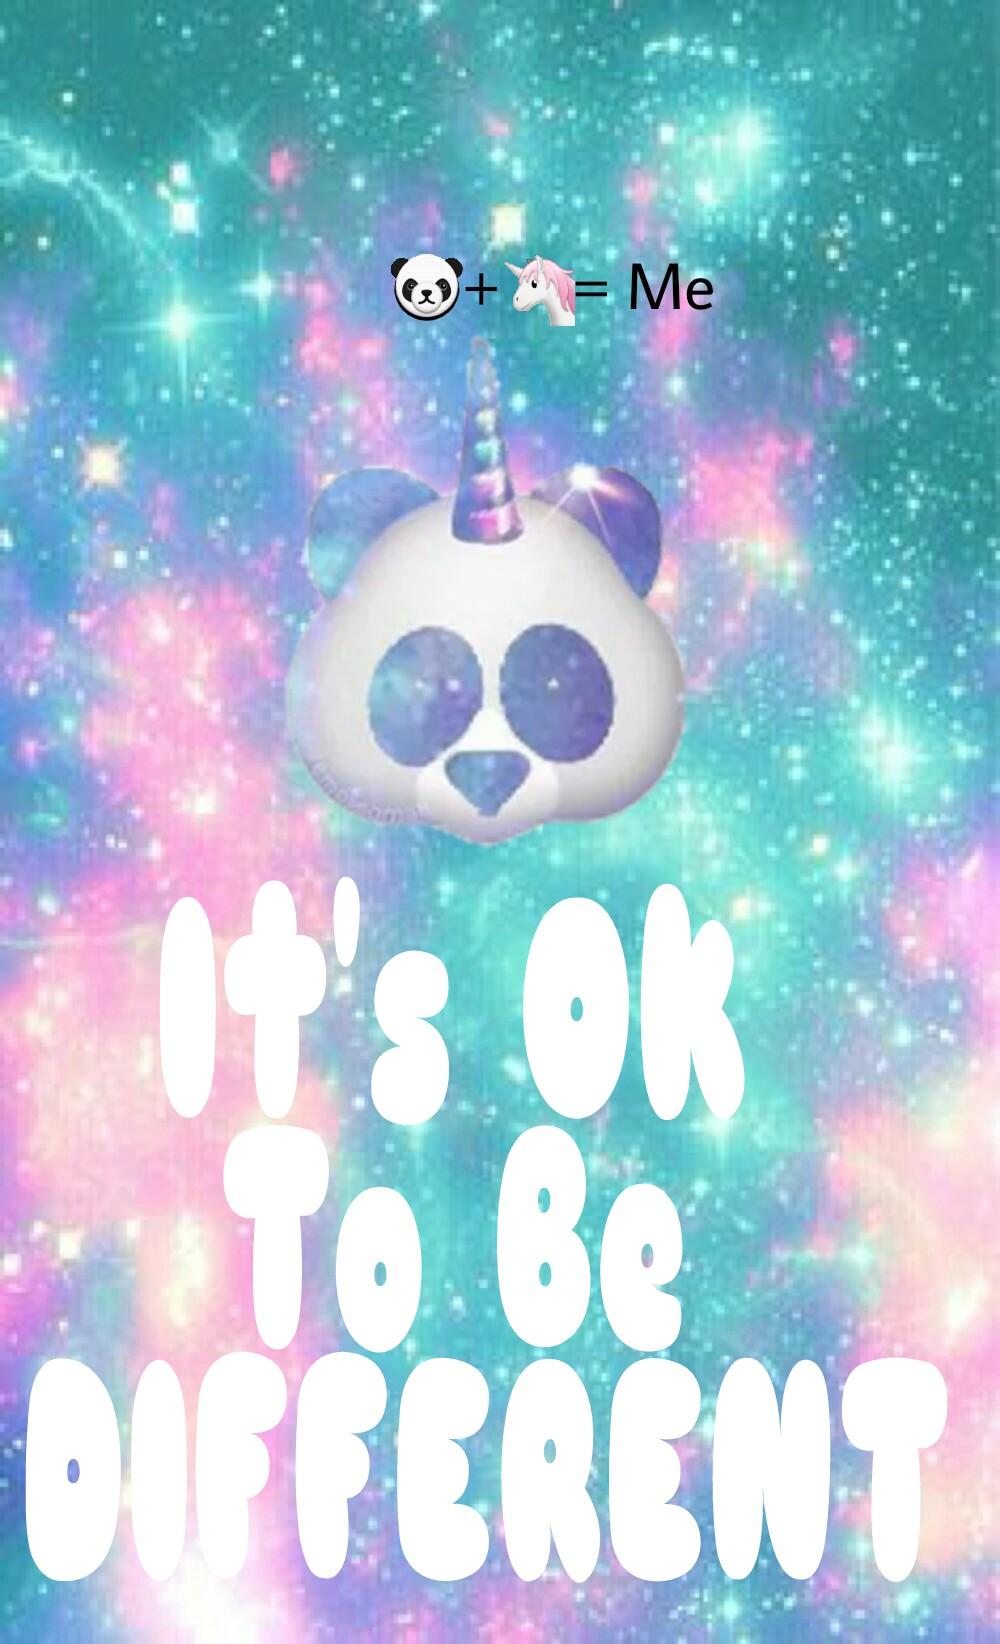 Panda Anime Wallpaper 1000 Awesome Pandacorn Images On Picsart